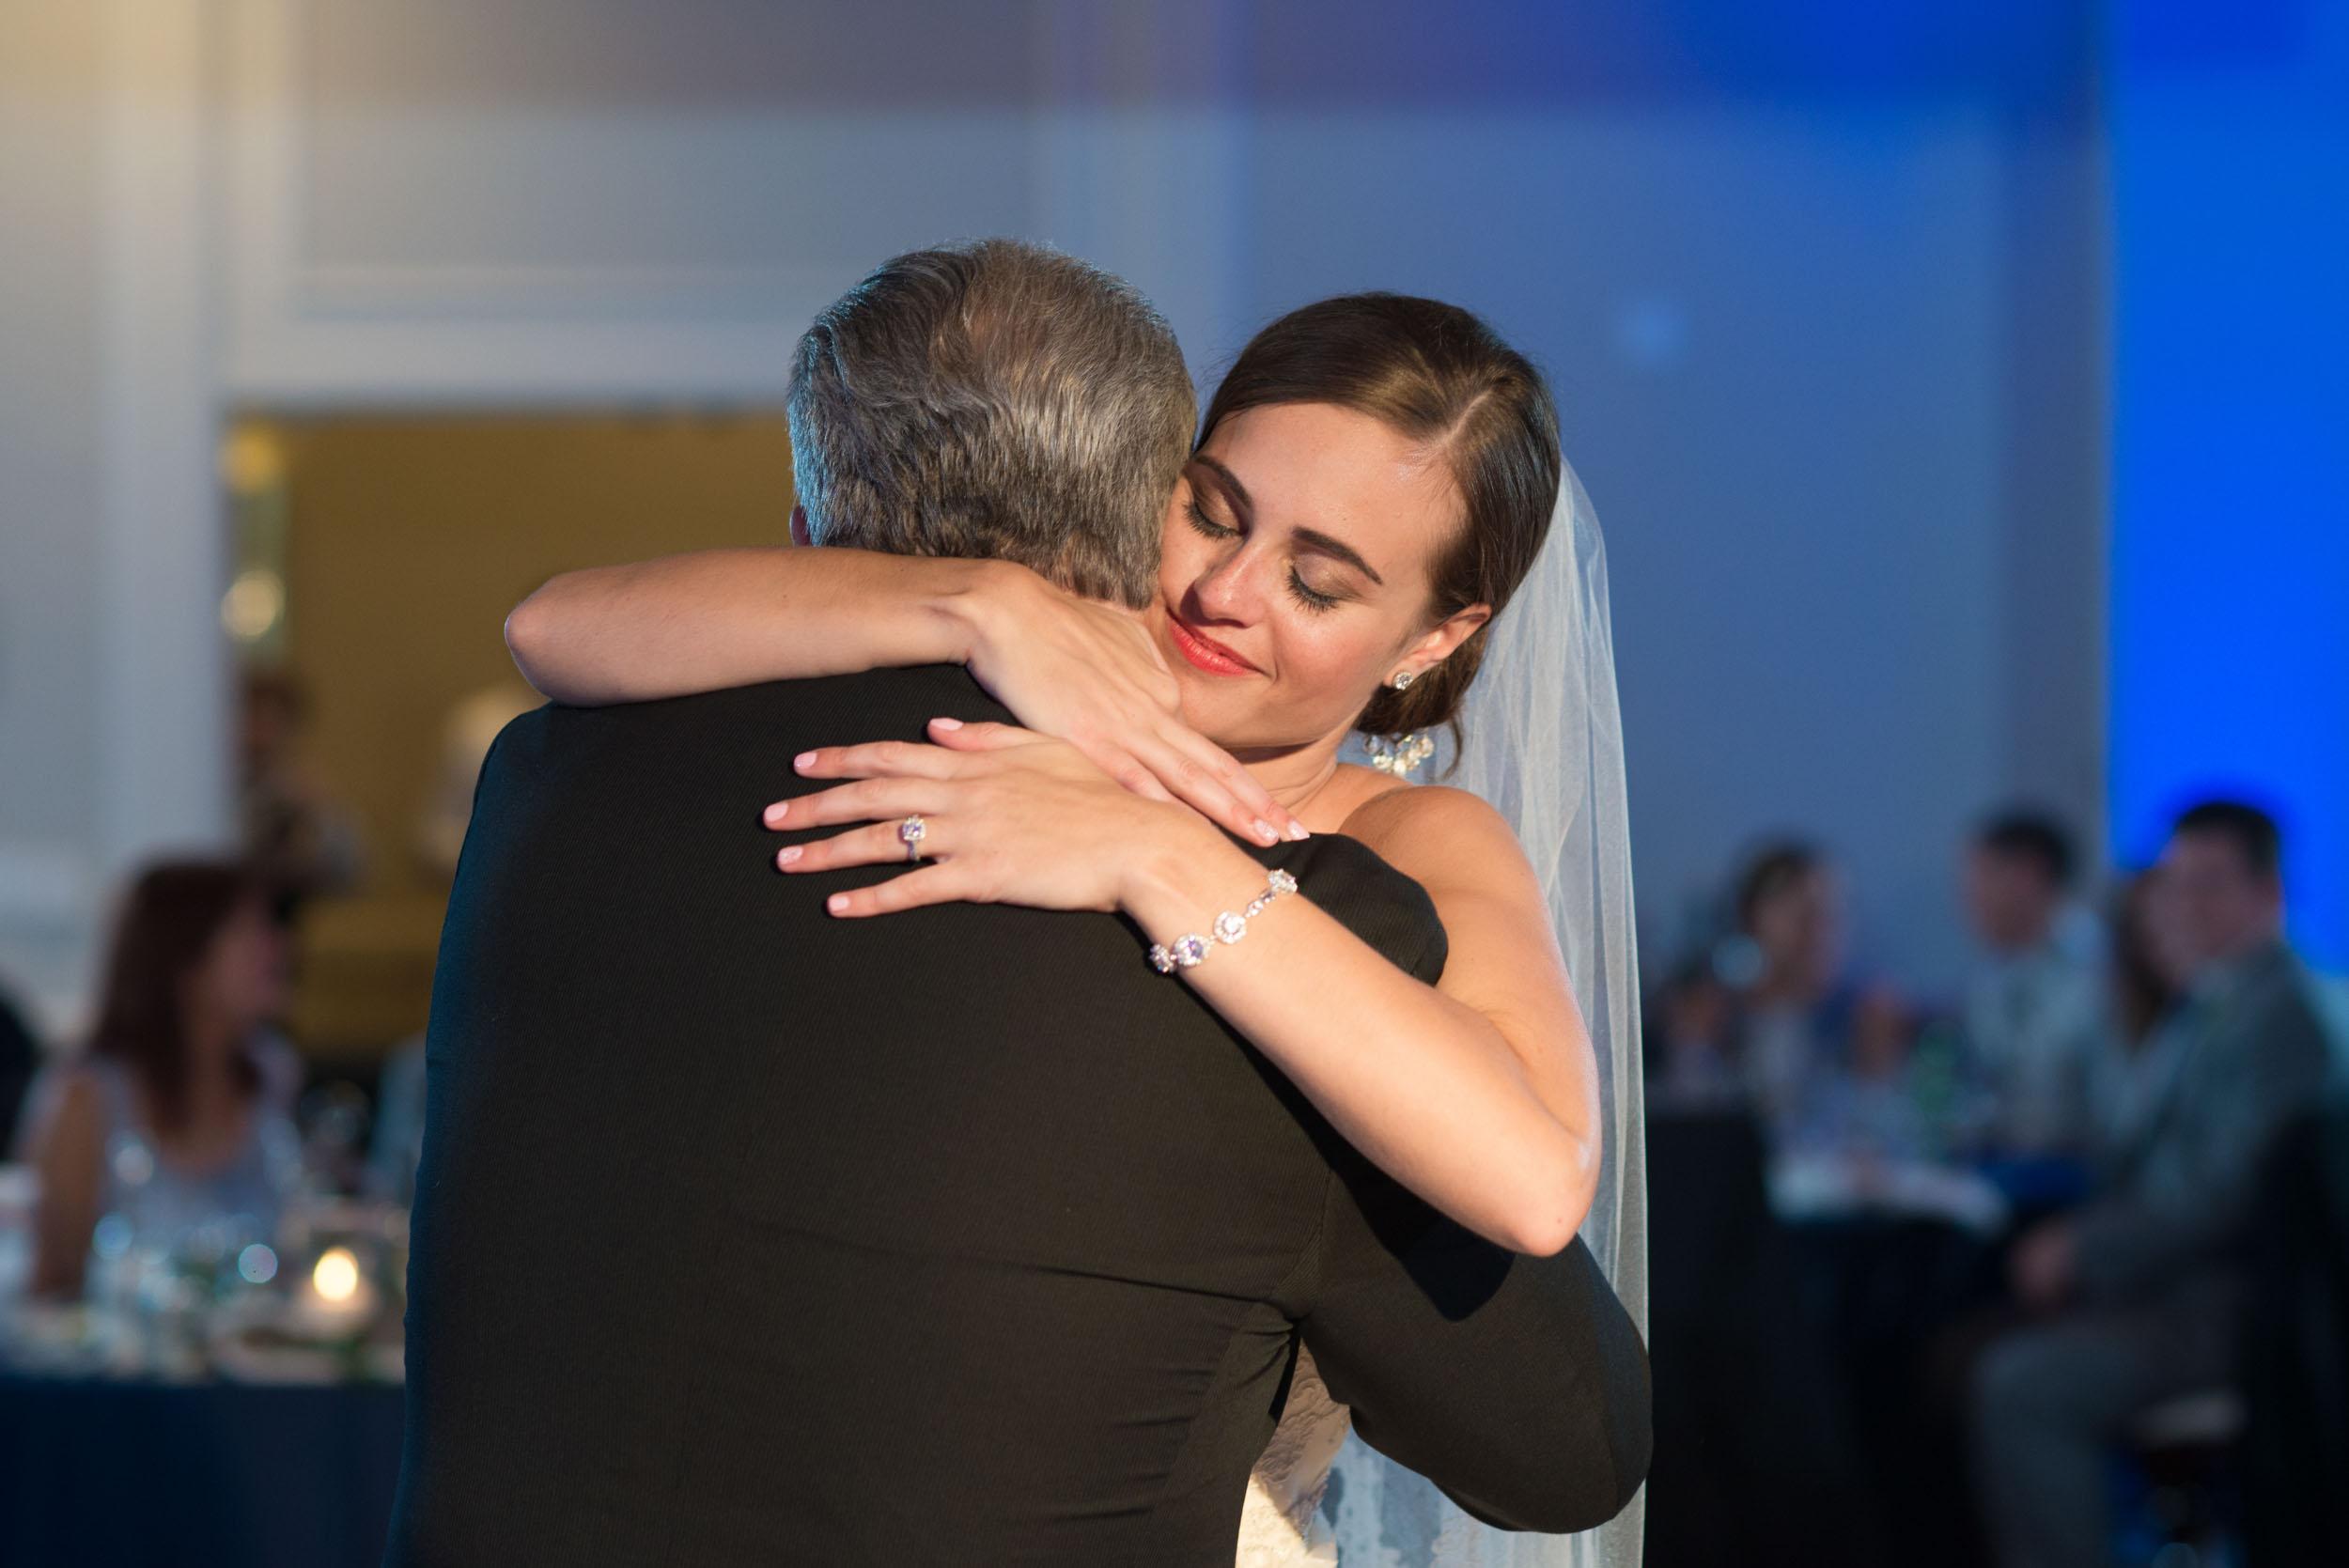 dc+metro+wedding+photographer+vadym+guliuk+photography+wedding+parent+dances-2020.jpg